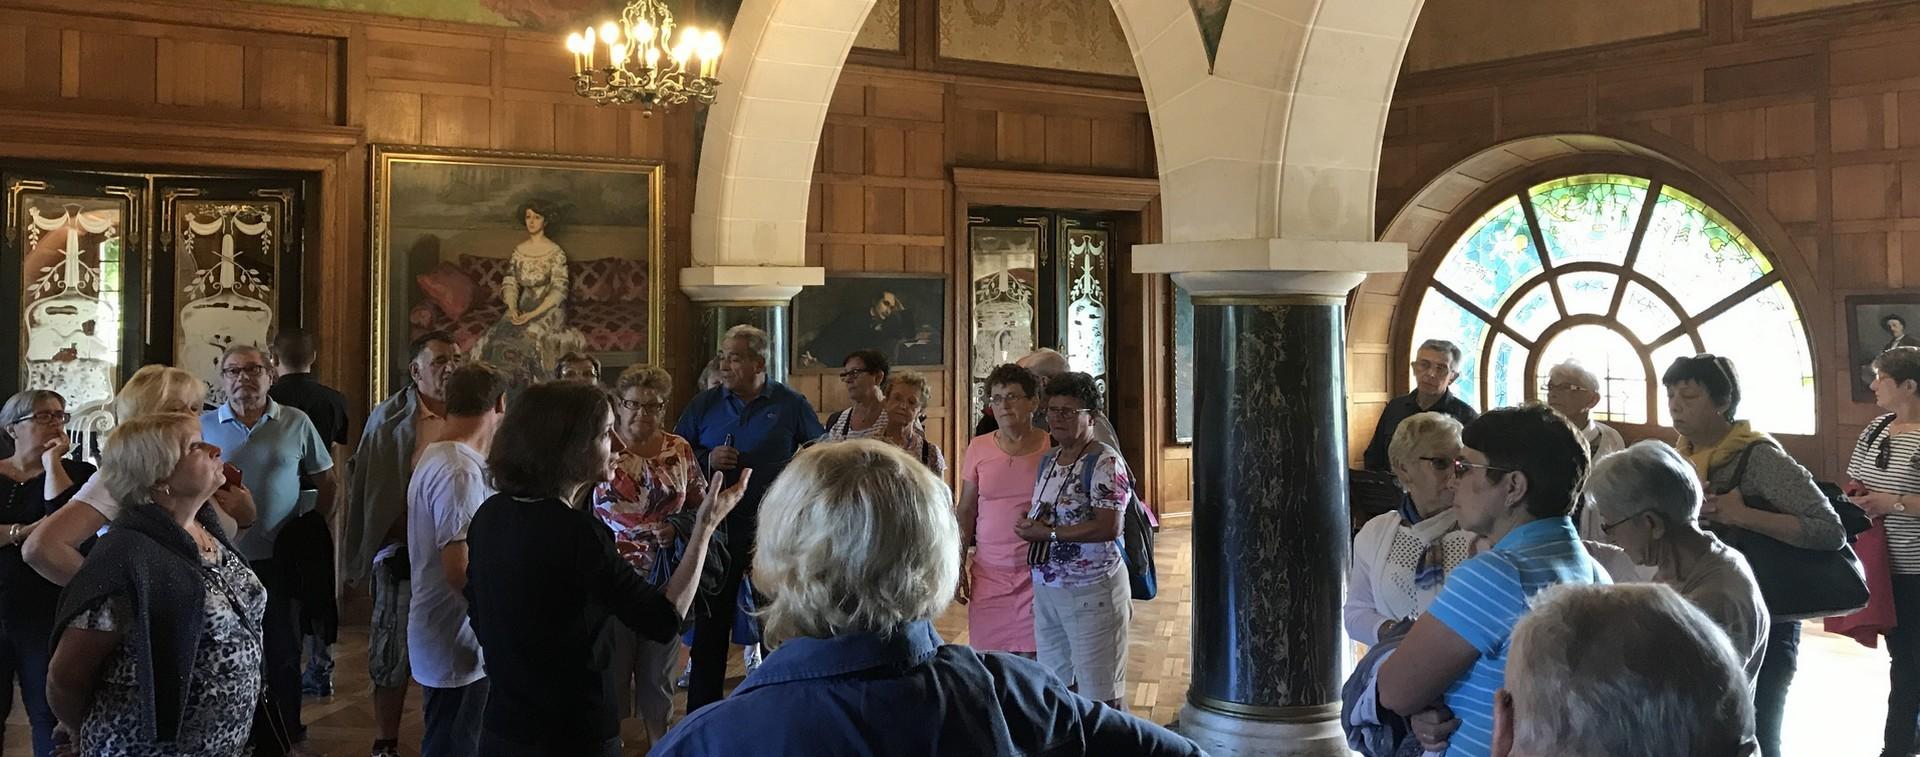 Villa Edmond rostand 2017